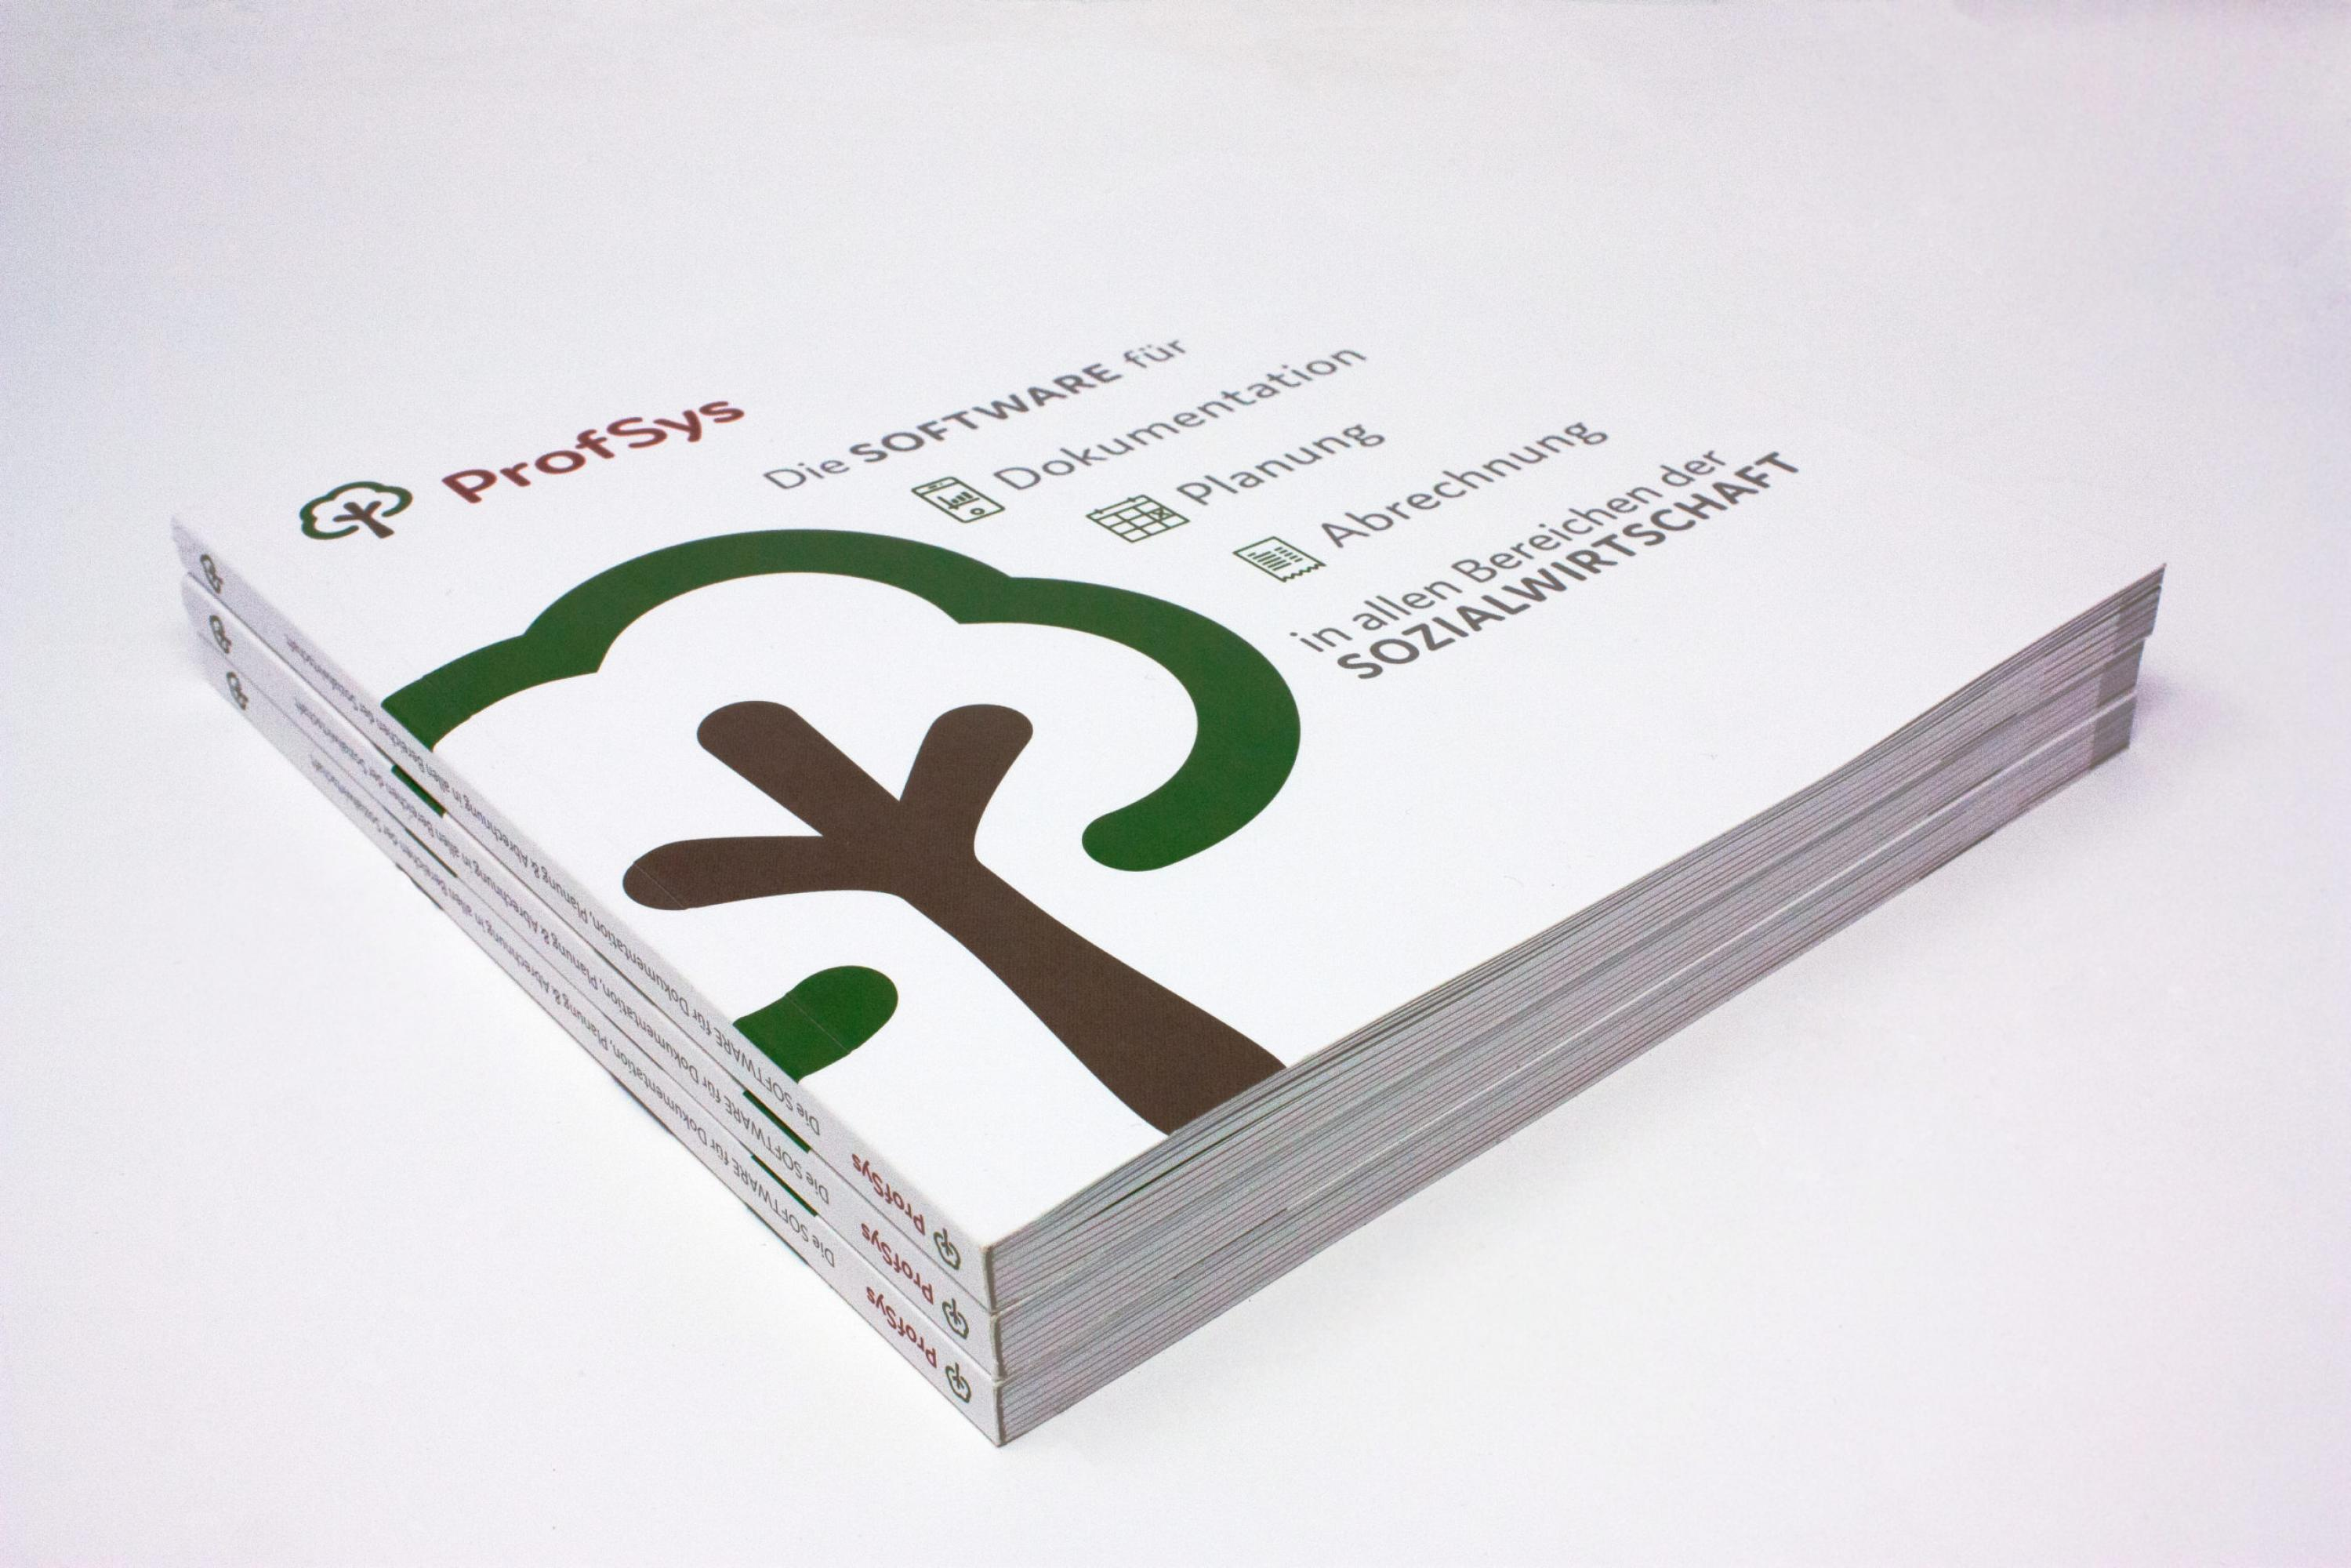 FORMLOS-ProfSys-Print-Broschüre-Corporate-Design-2